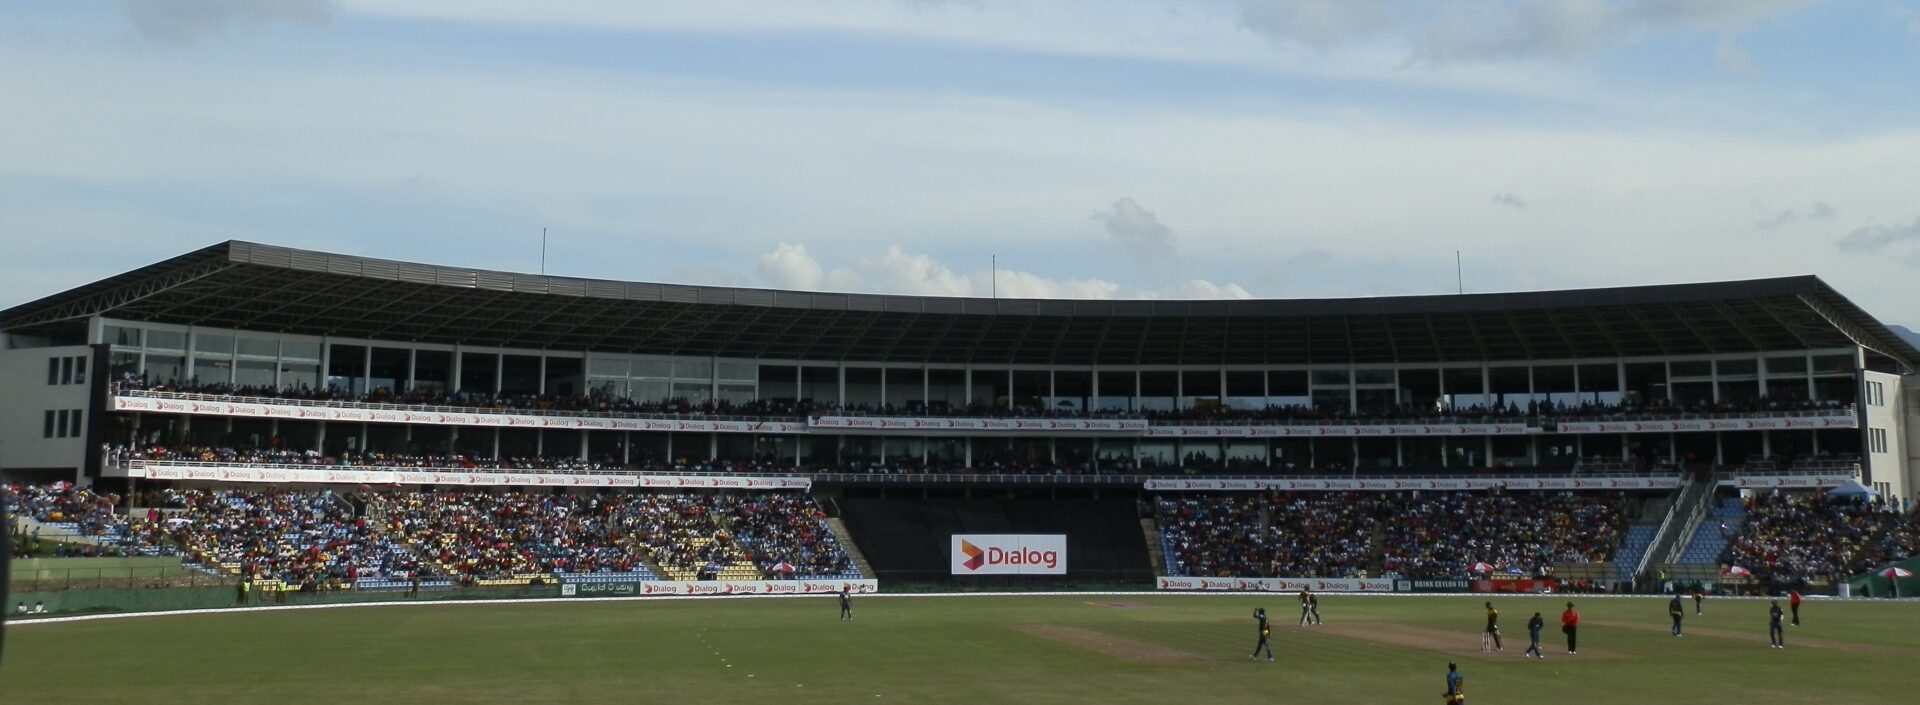 Pellekele International Cricket Stadium, Kandy